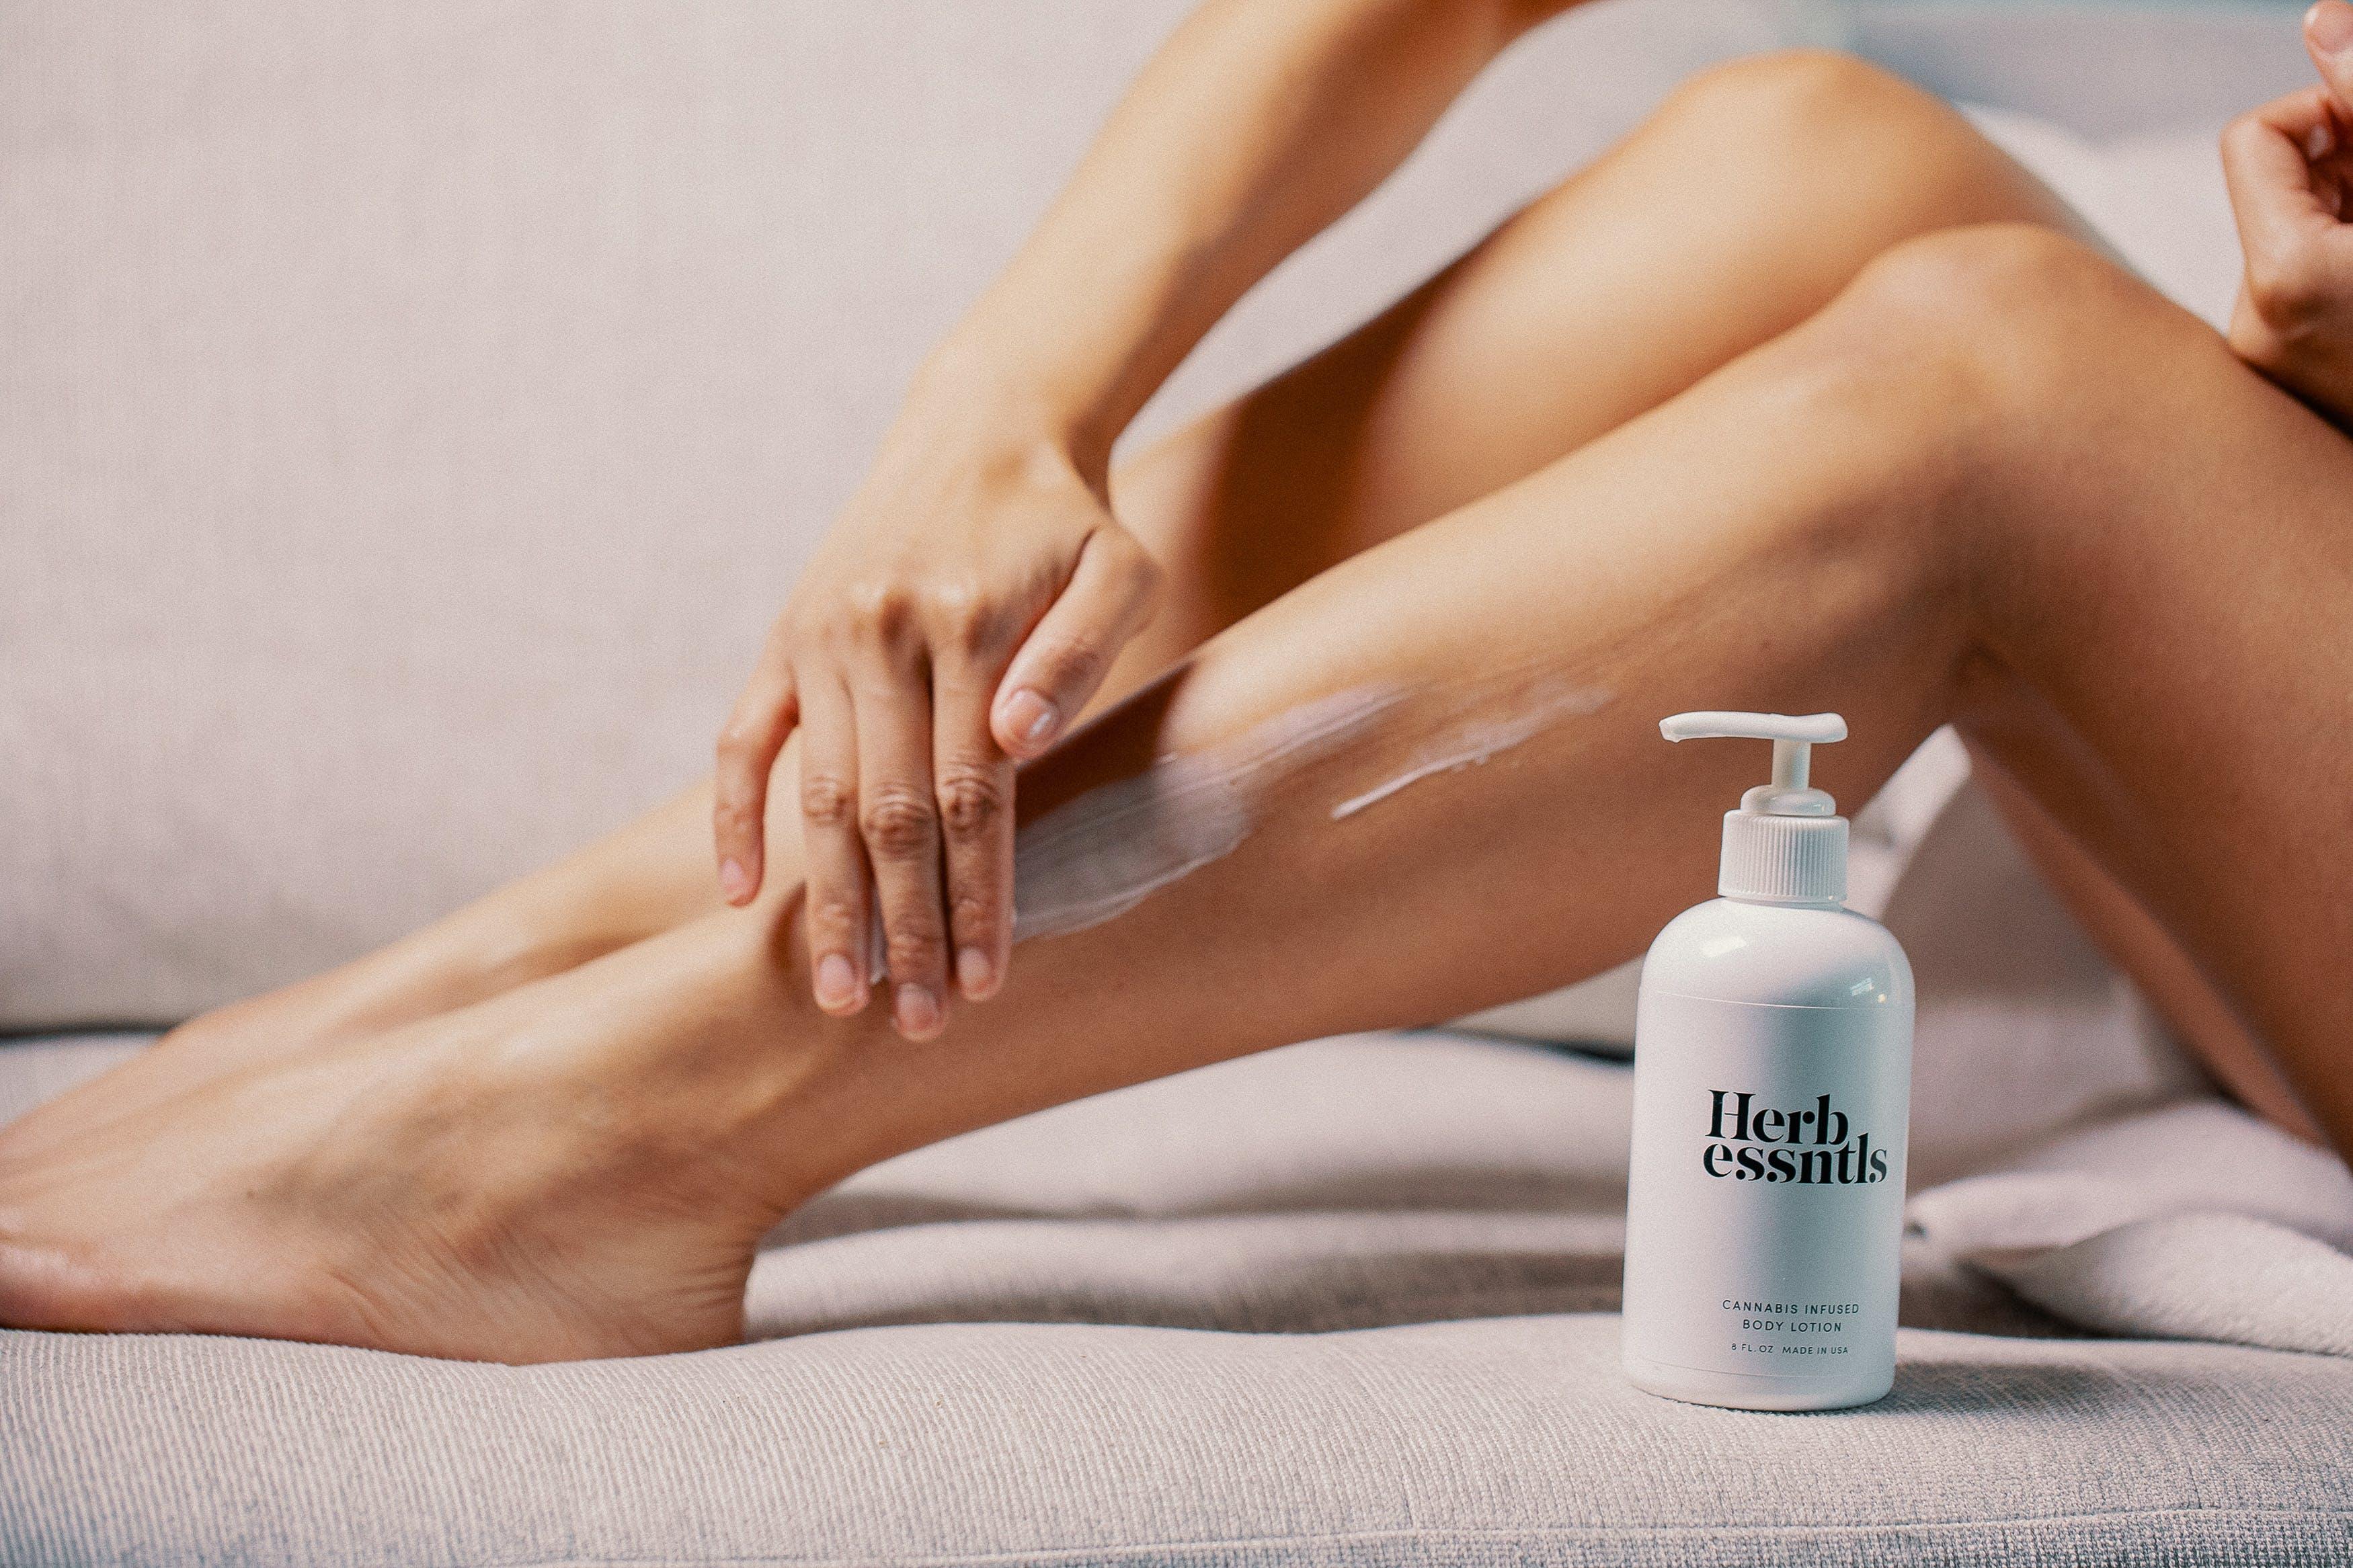 CBD for Psoriasis2 CBD for Psoriasis: Can Cannabidiol Help Itching, Irritated Skin?